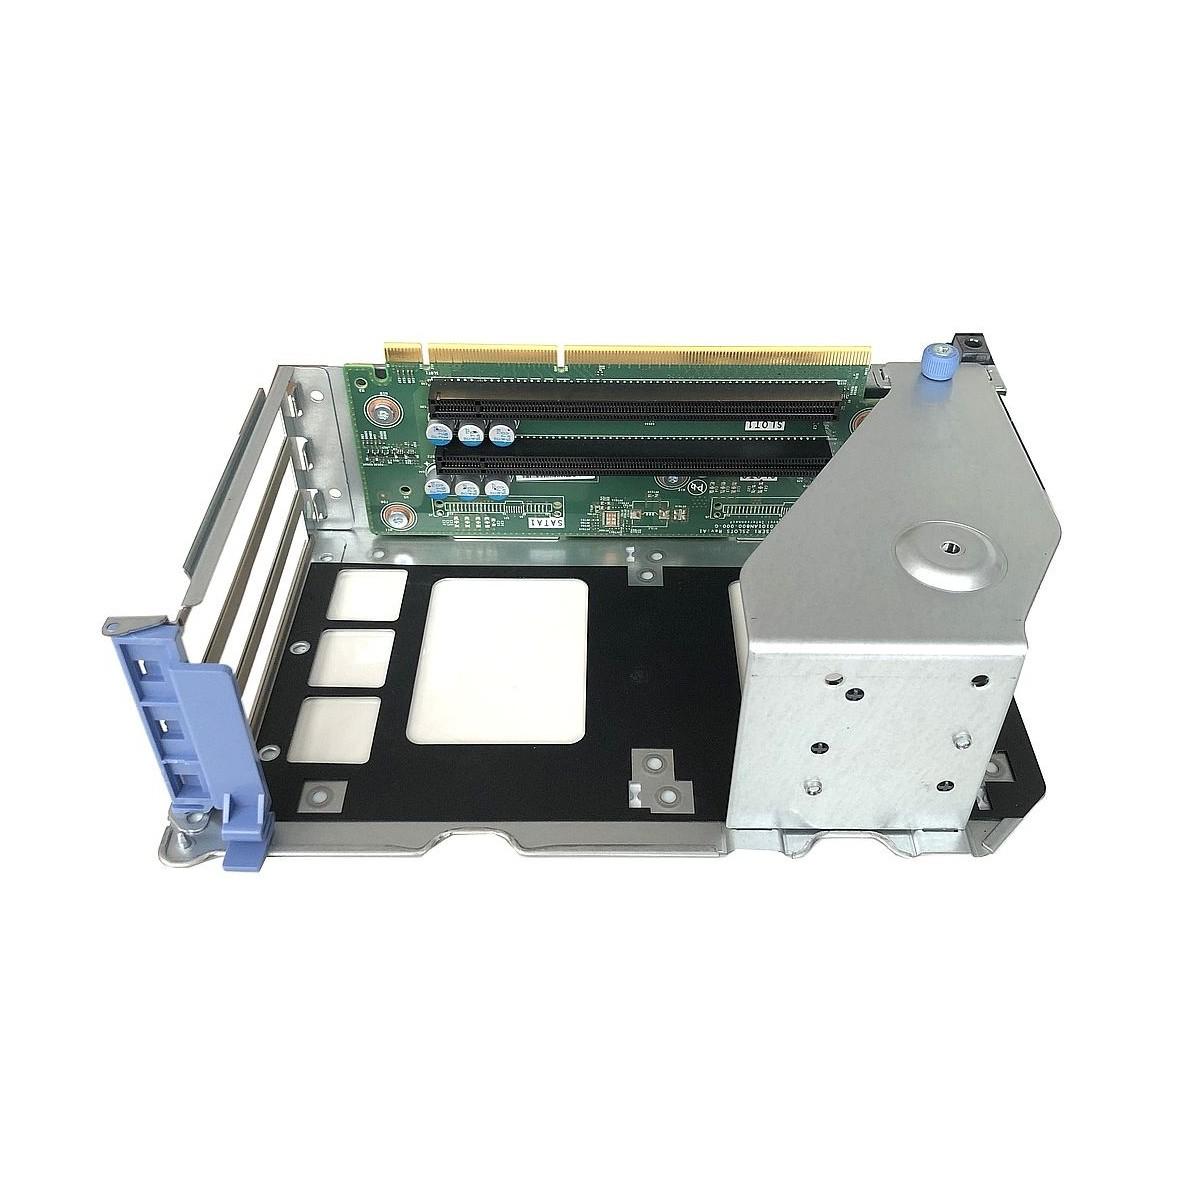 IBM x3500 M4 2x8CORE E5-2680 32GB 2xSSD 12x1TB